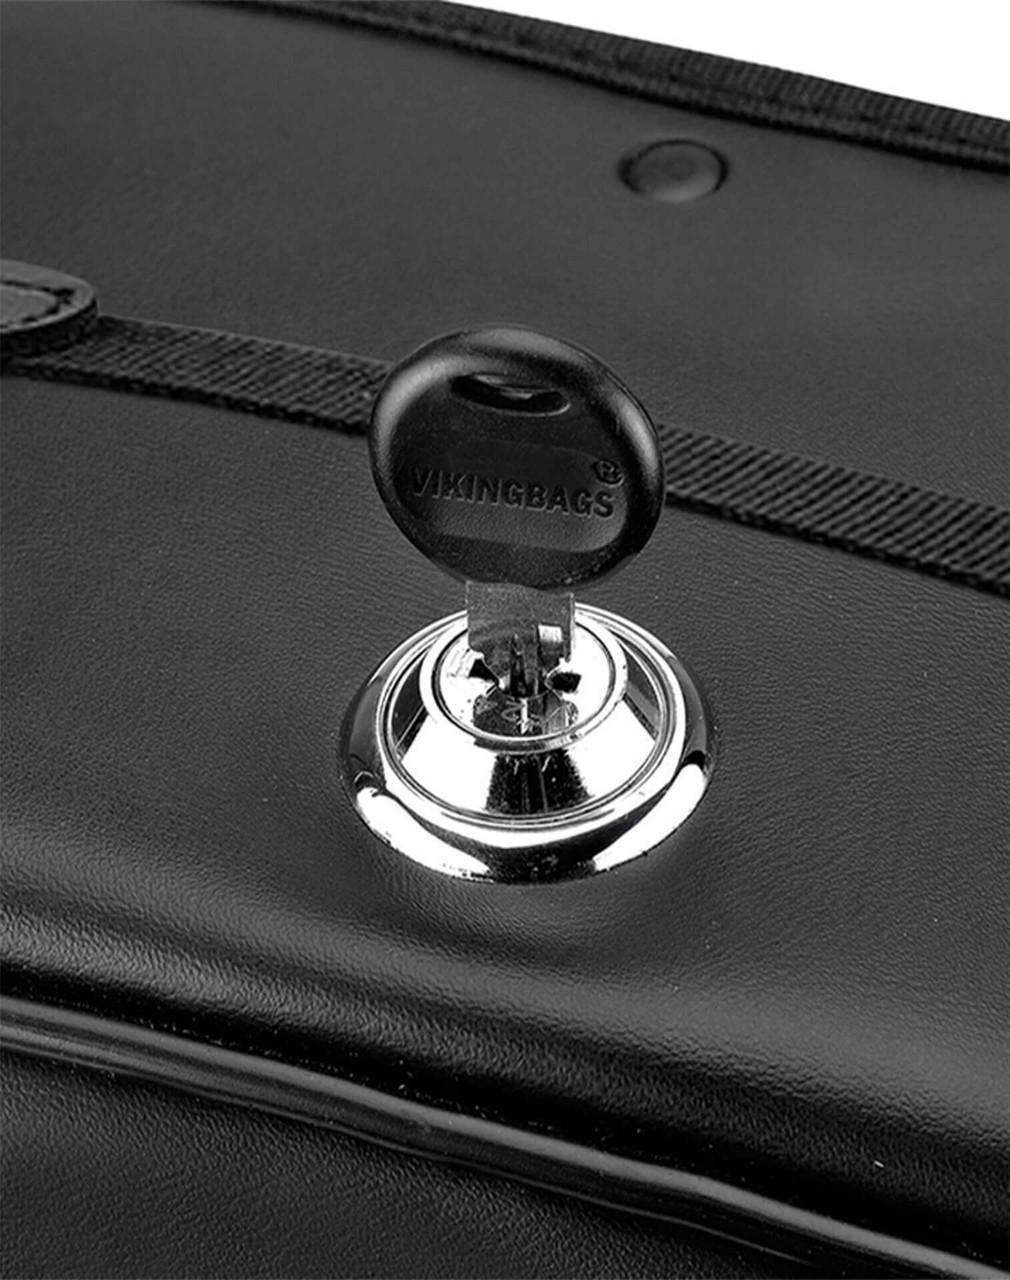 Triumph Thunderbird Shock Cutout Studded Motorcycle Saddlebags Key Lock View